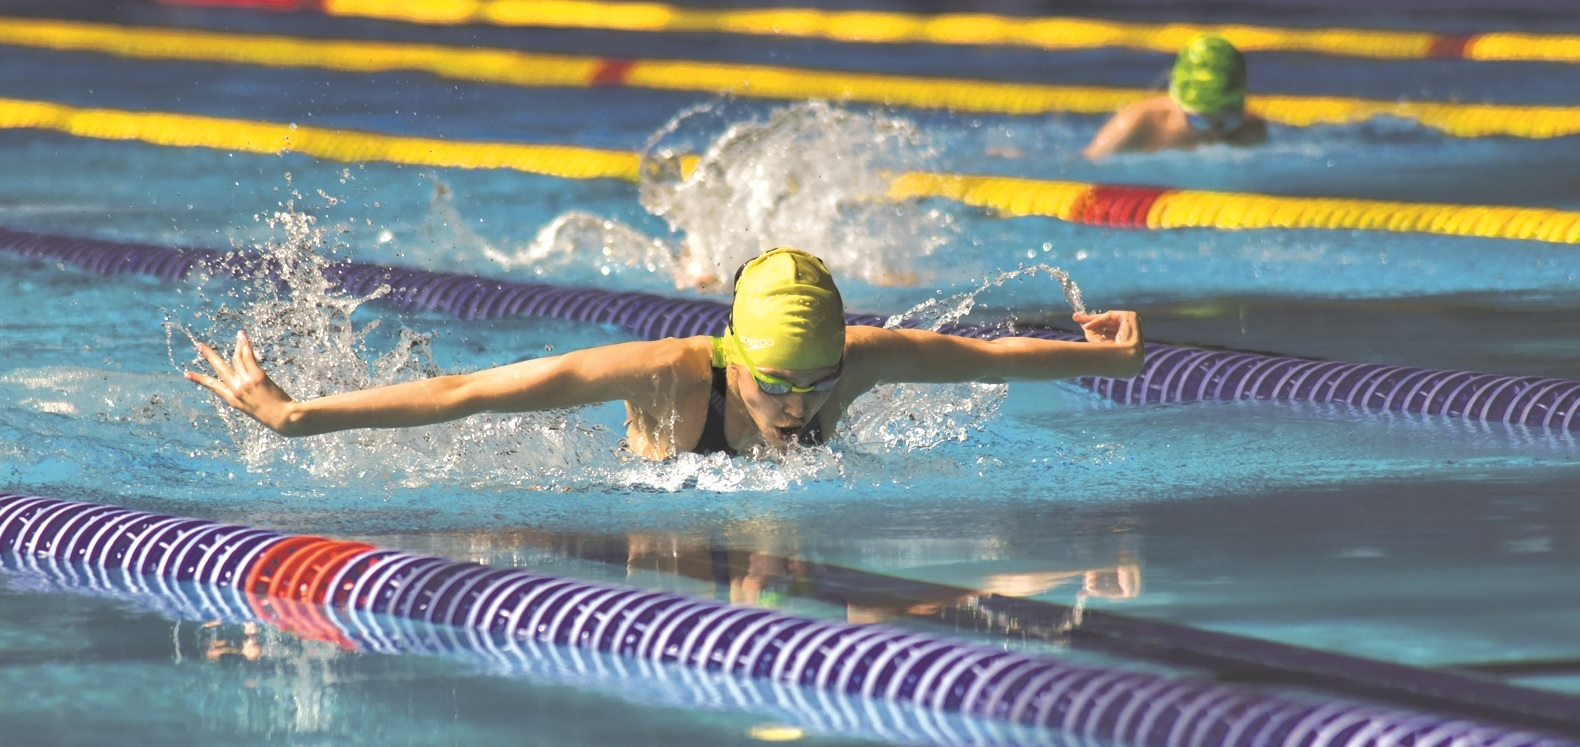 Пловчиха Арина Суркова в бассейне